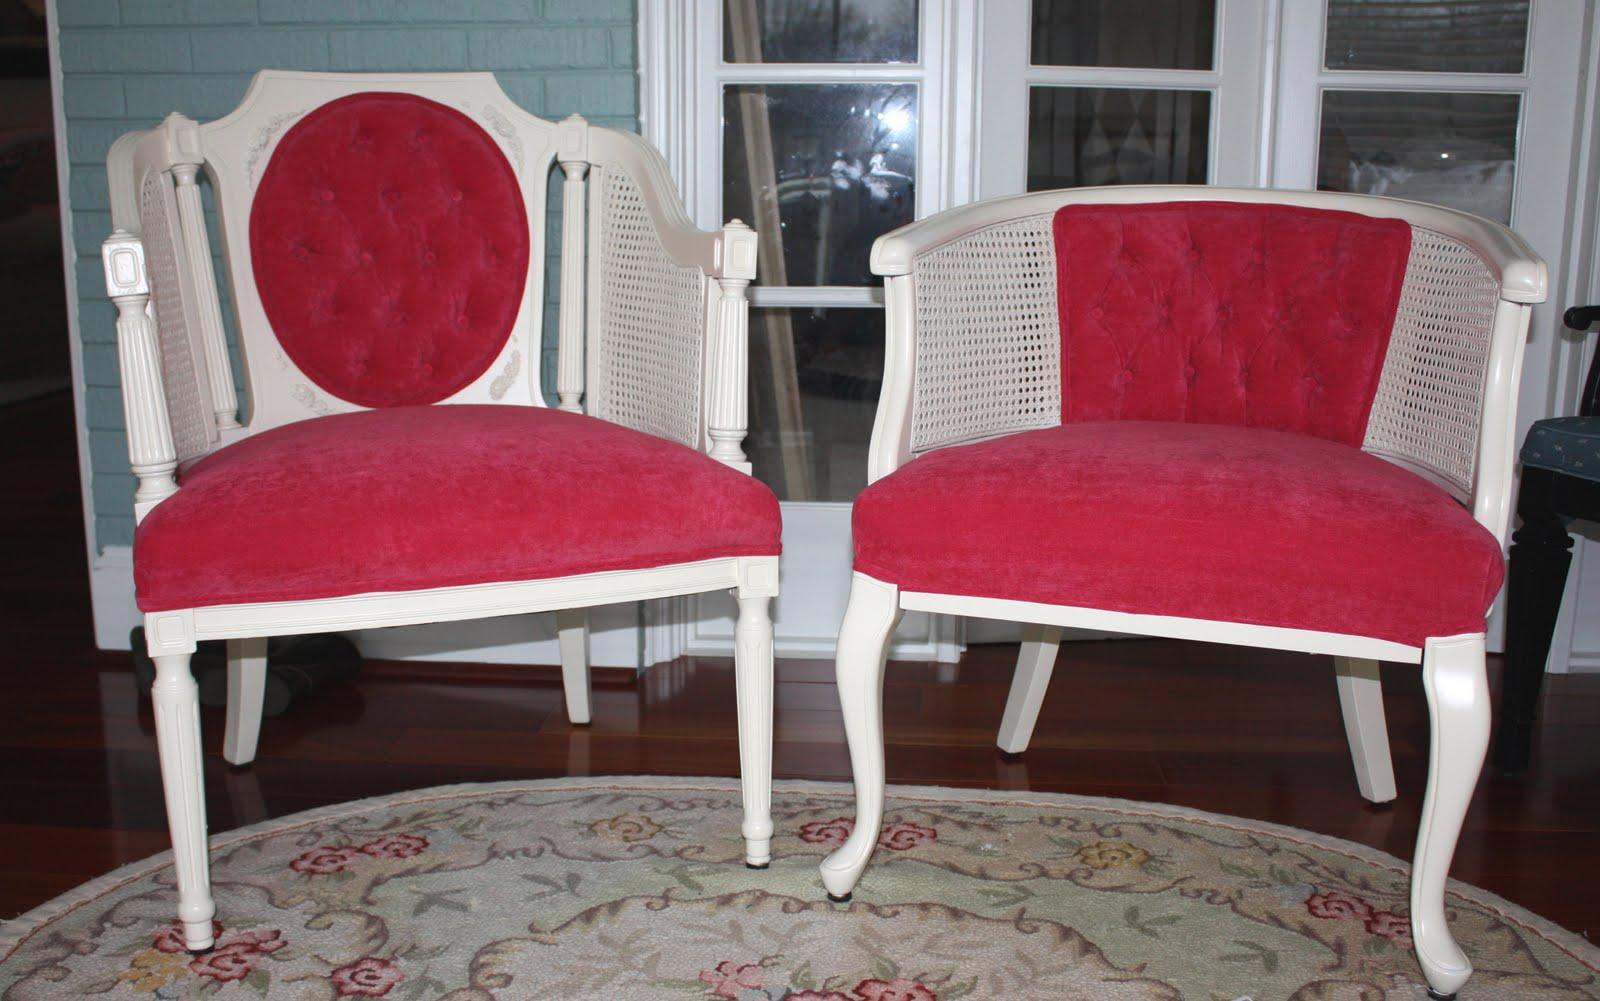 http://1.bp.blogspot.com/_-ivQALnvl64/TBIjiDvYTZI/AAAAAAAABUA/VsAFGDIA9Us/s1600/Pink+Chairs+001.JPG